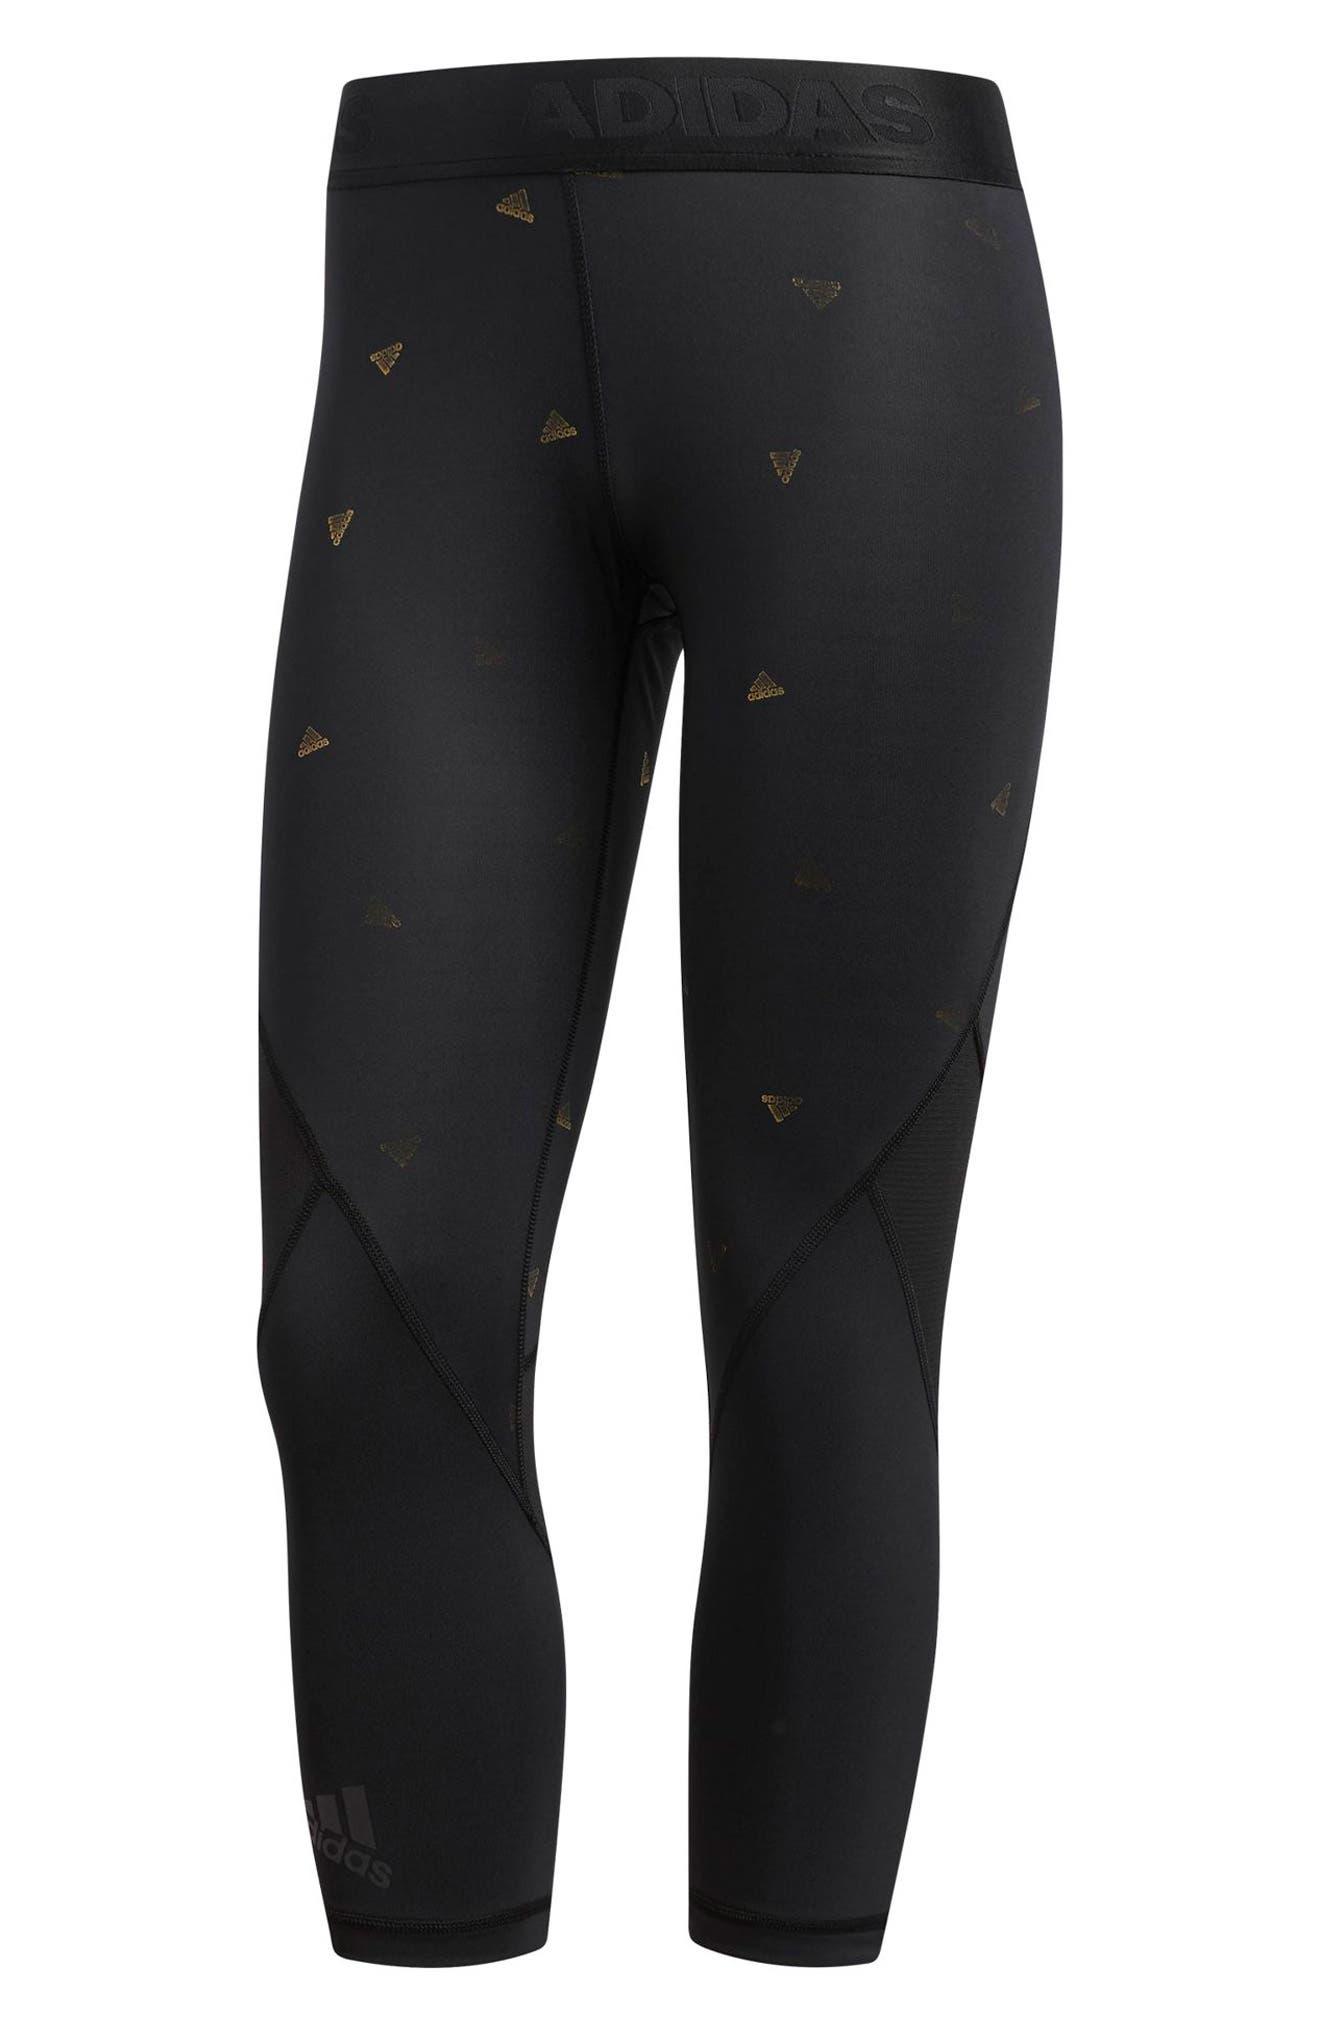 Alphaskin Sport Capri Leggings,                             Alternate thumbnail 5, color,                             Black / Print